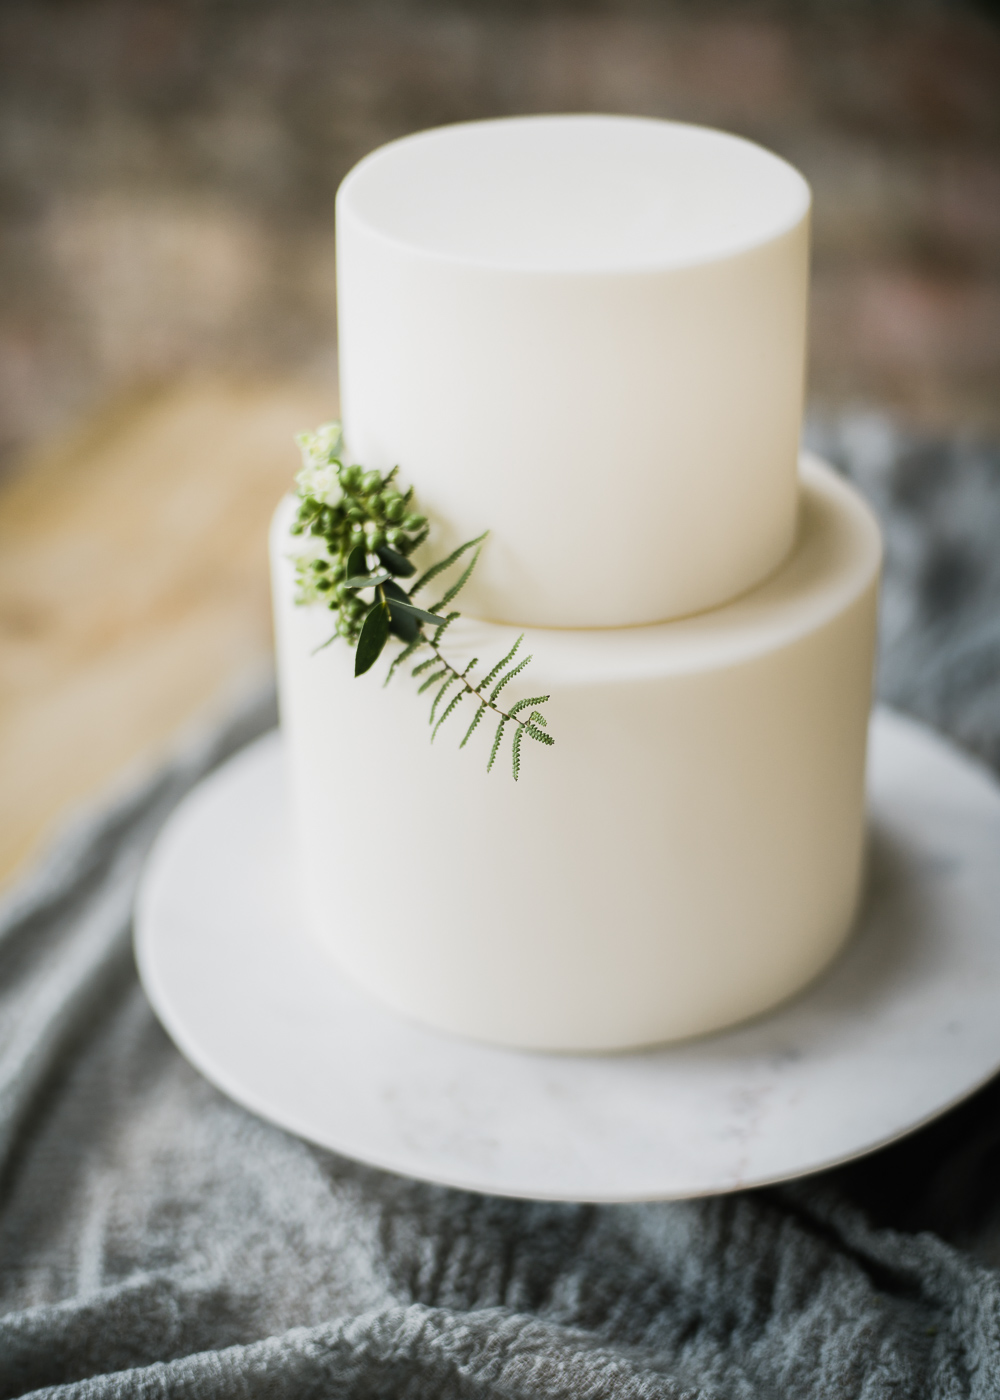 An elegant white wedding cake adorned with foliage.